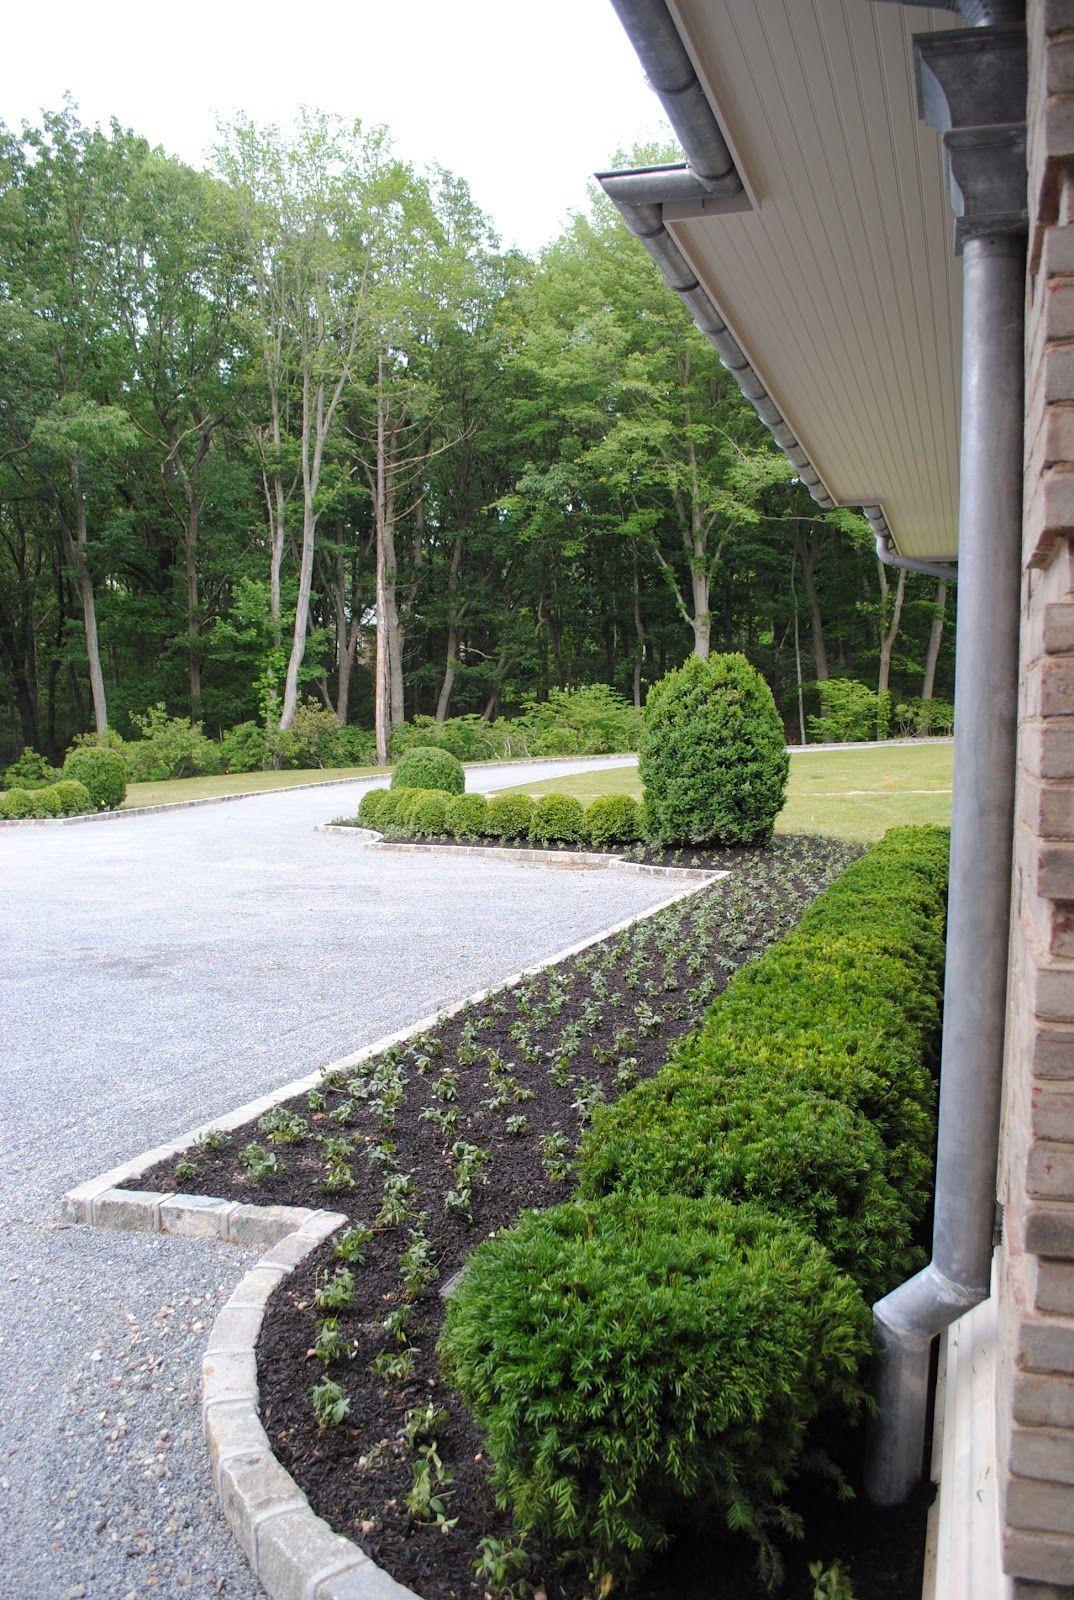 driveway edging and bush border